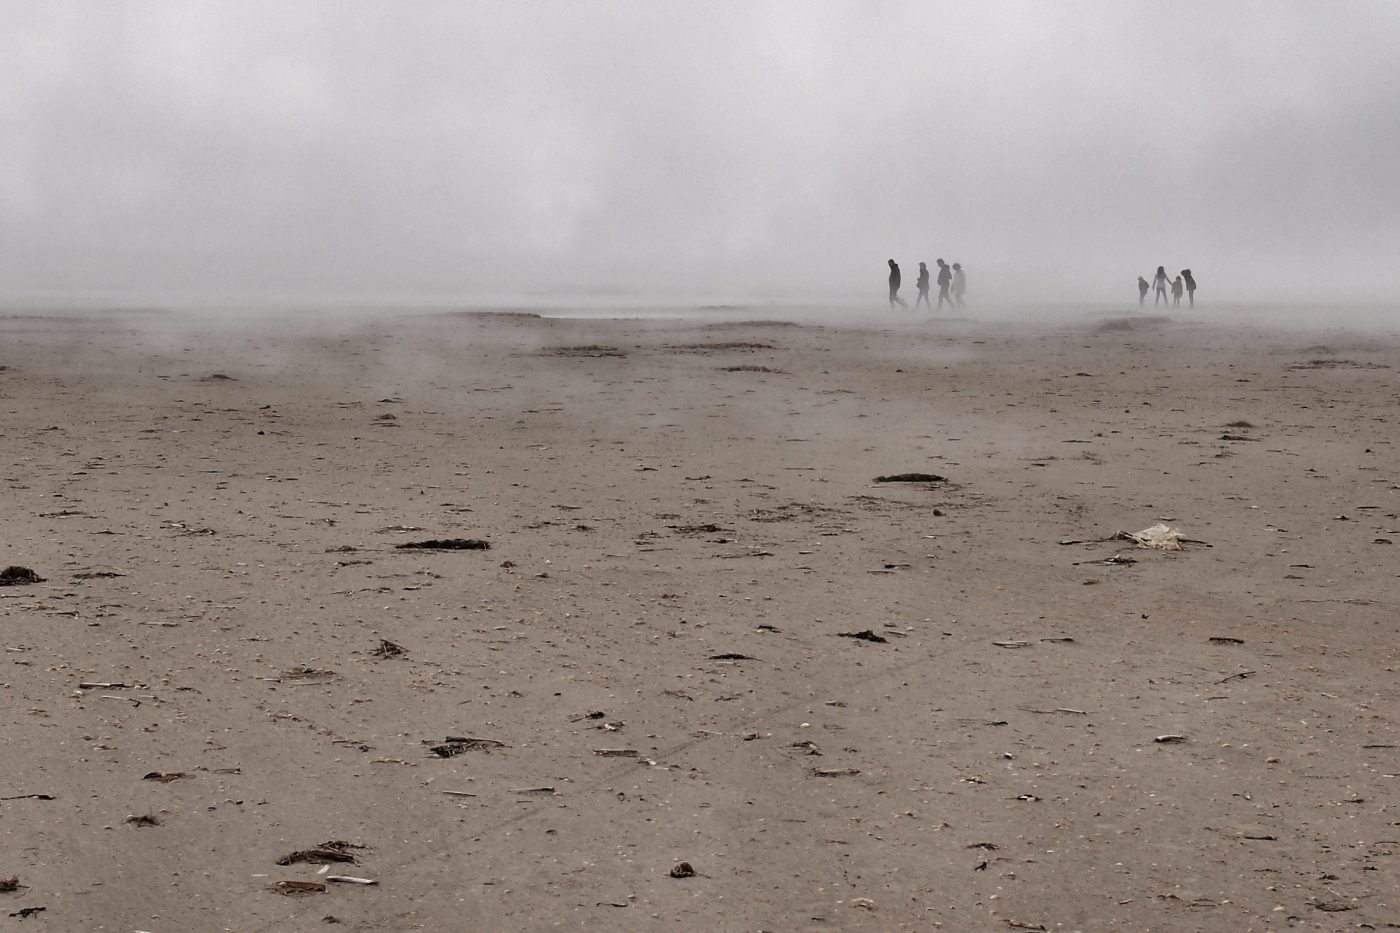 Strand im Nebel auf Fanø.